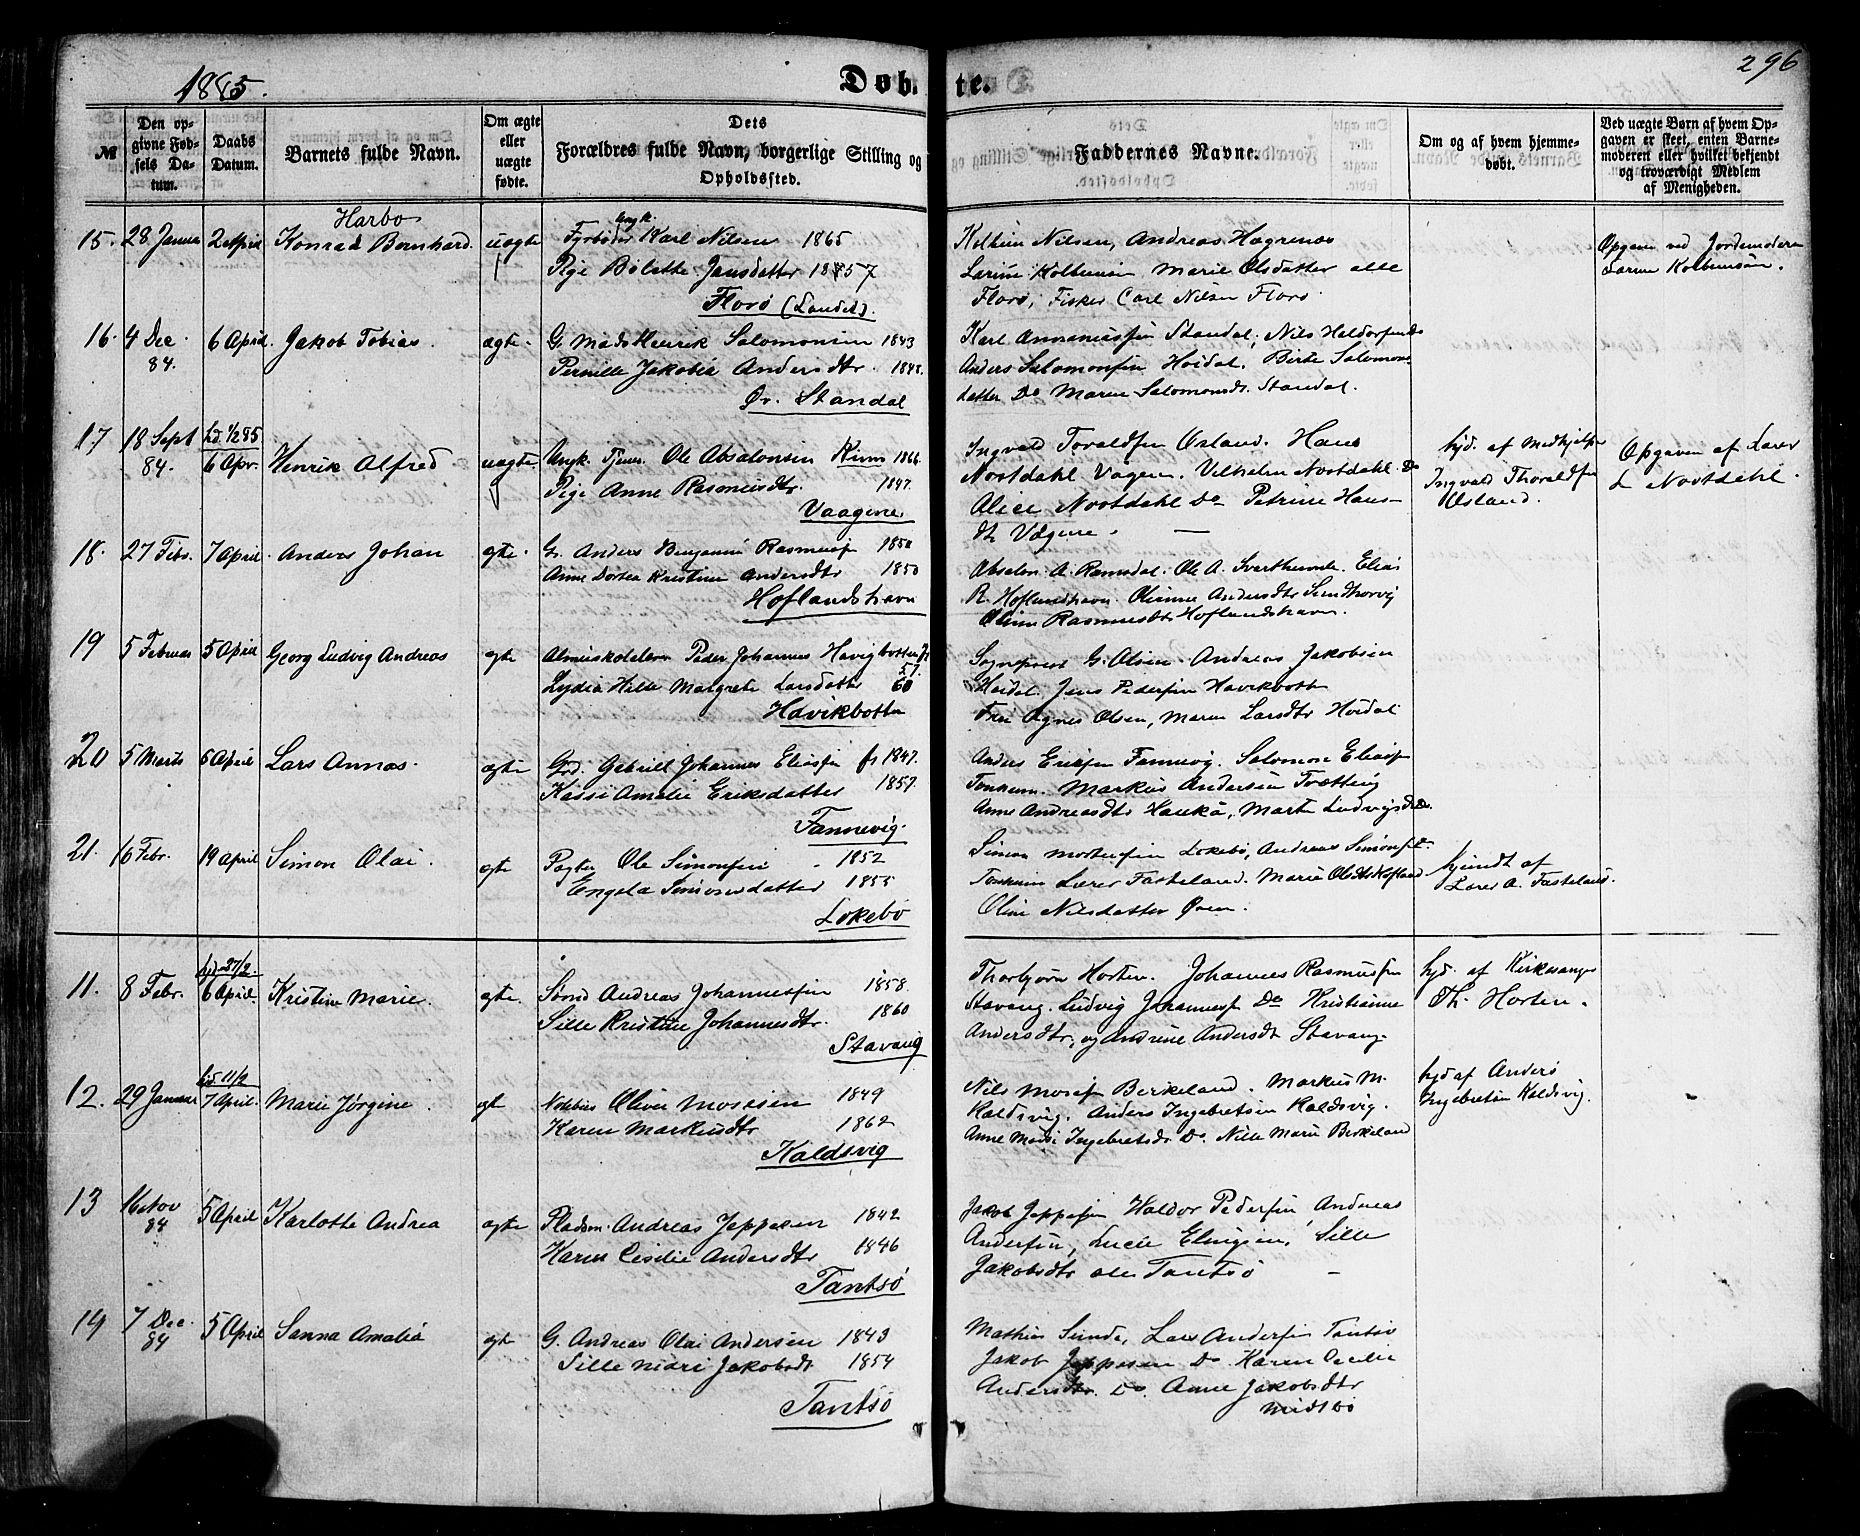 SAB, Kinn sokneprestembete, H/Haa/Haaa/L0006: Parish register (official) no. A 6, 1857-1885, p. 296